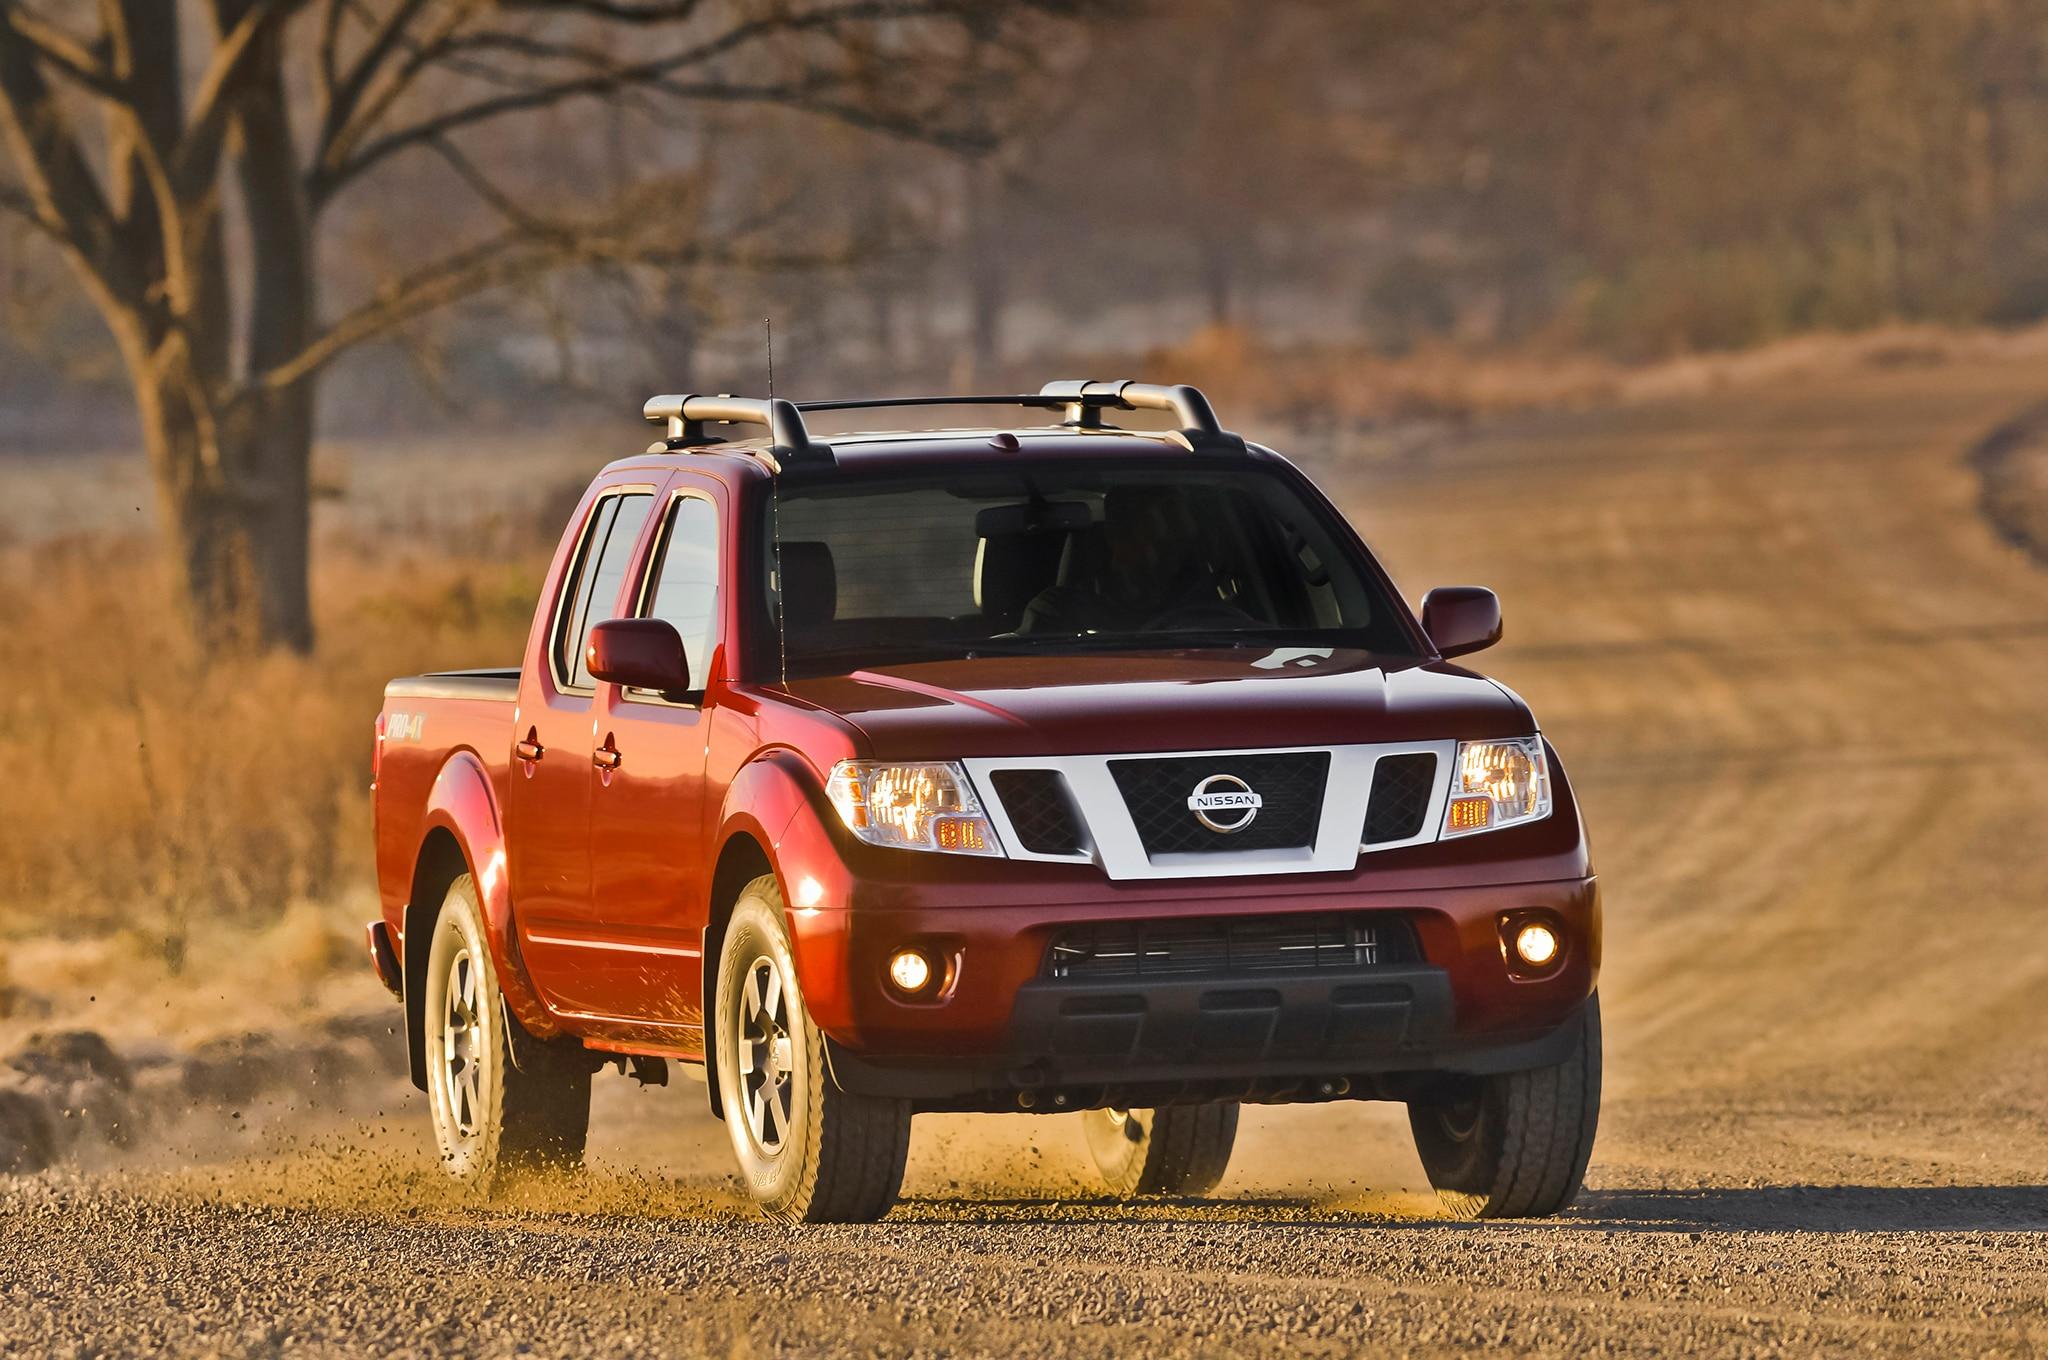 2014 Nissan Frontier Crew Cab Three Quarters View 0031